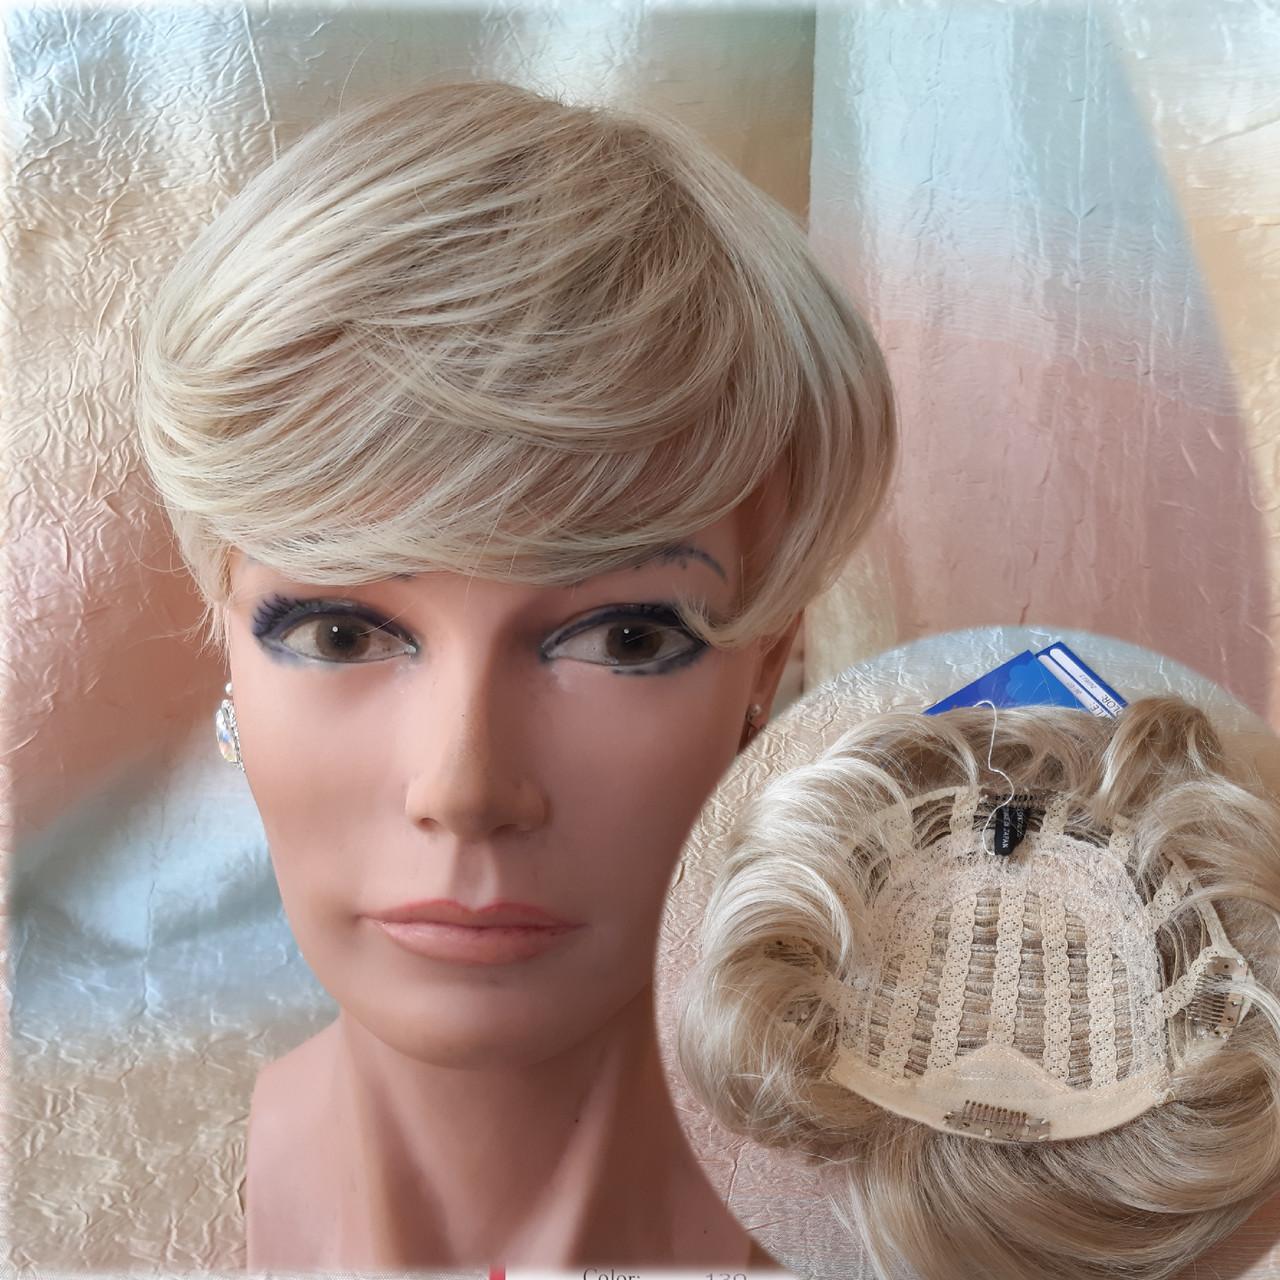 Полупарик, накладка на макушку на зажимах платиновый блонд 05-07 - 15ВТ613